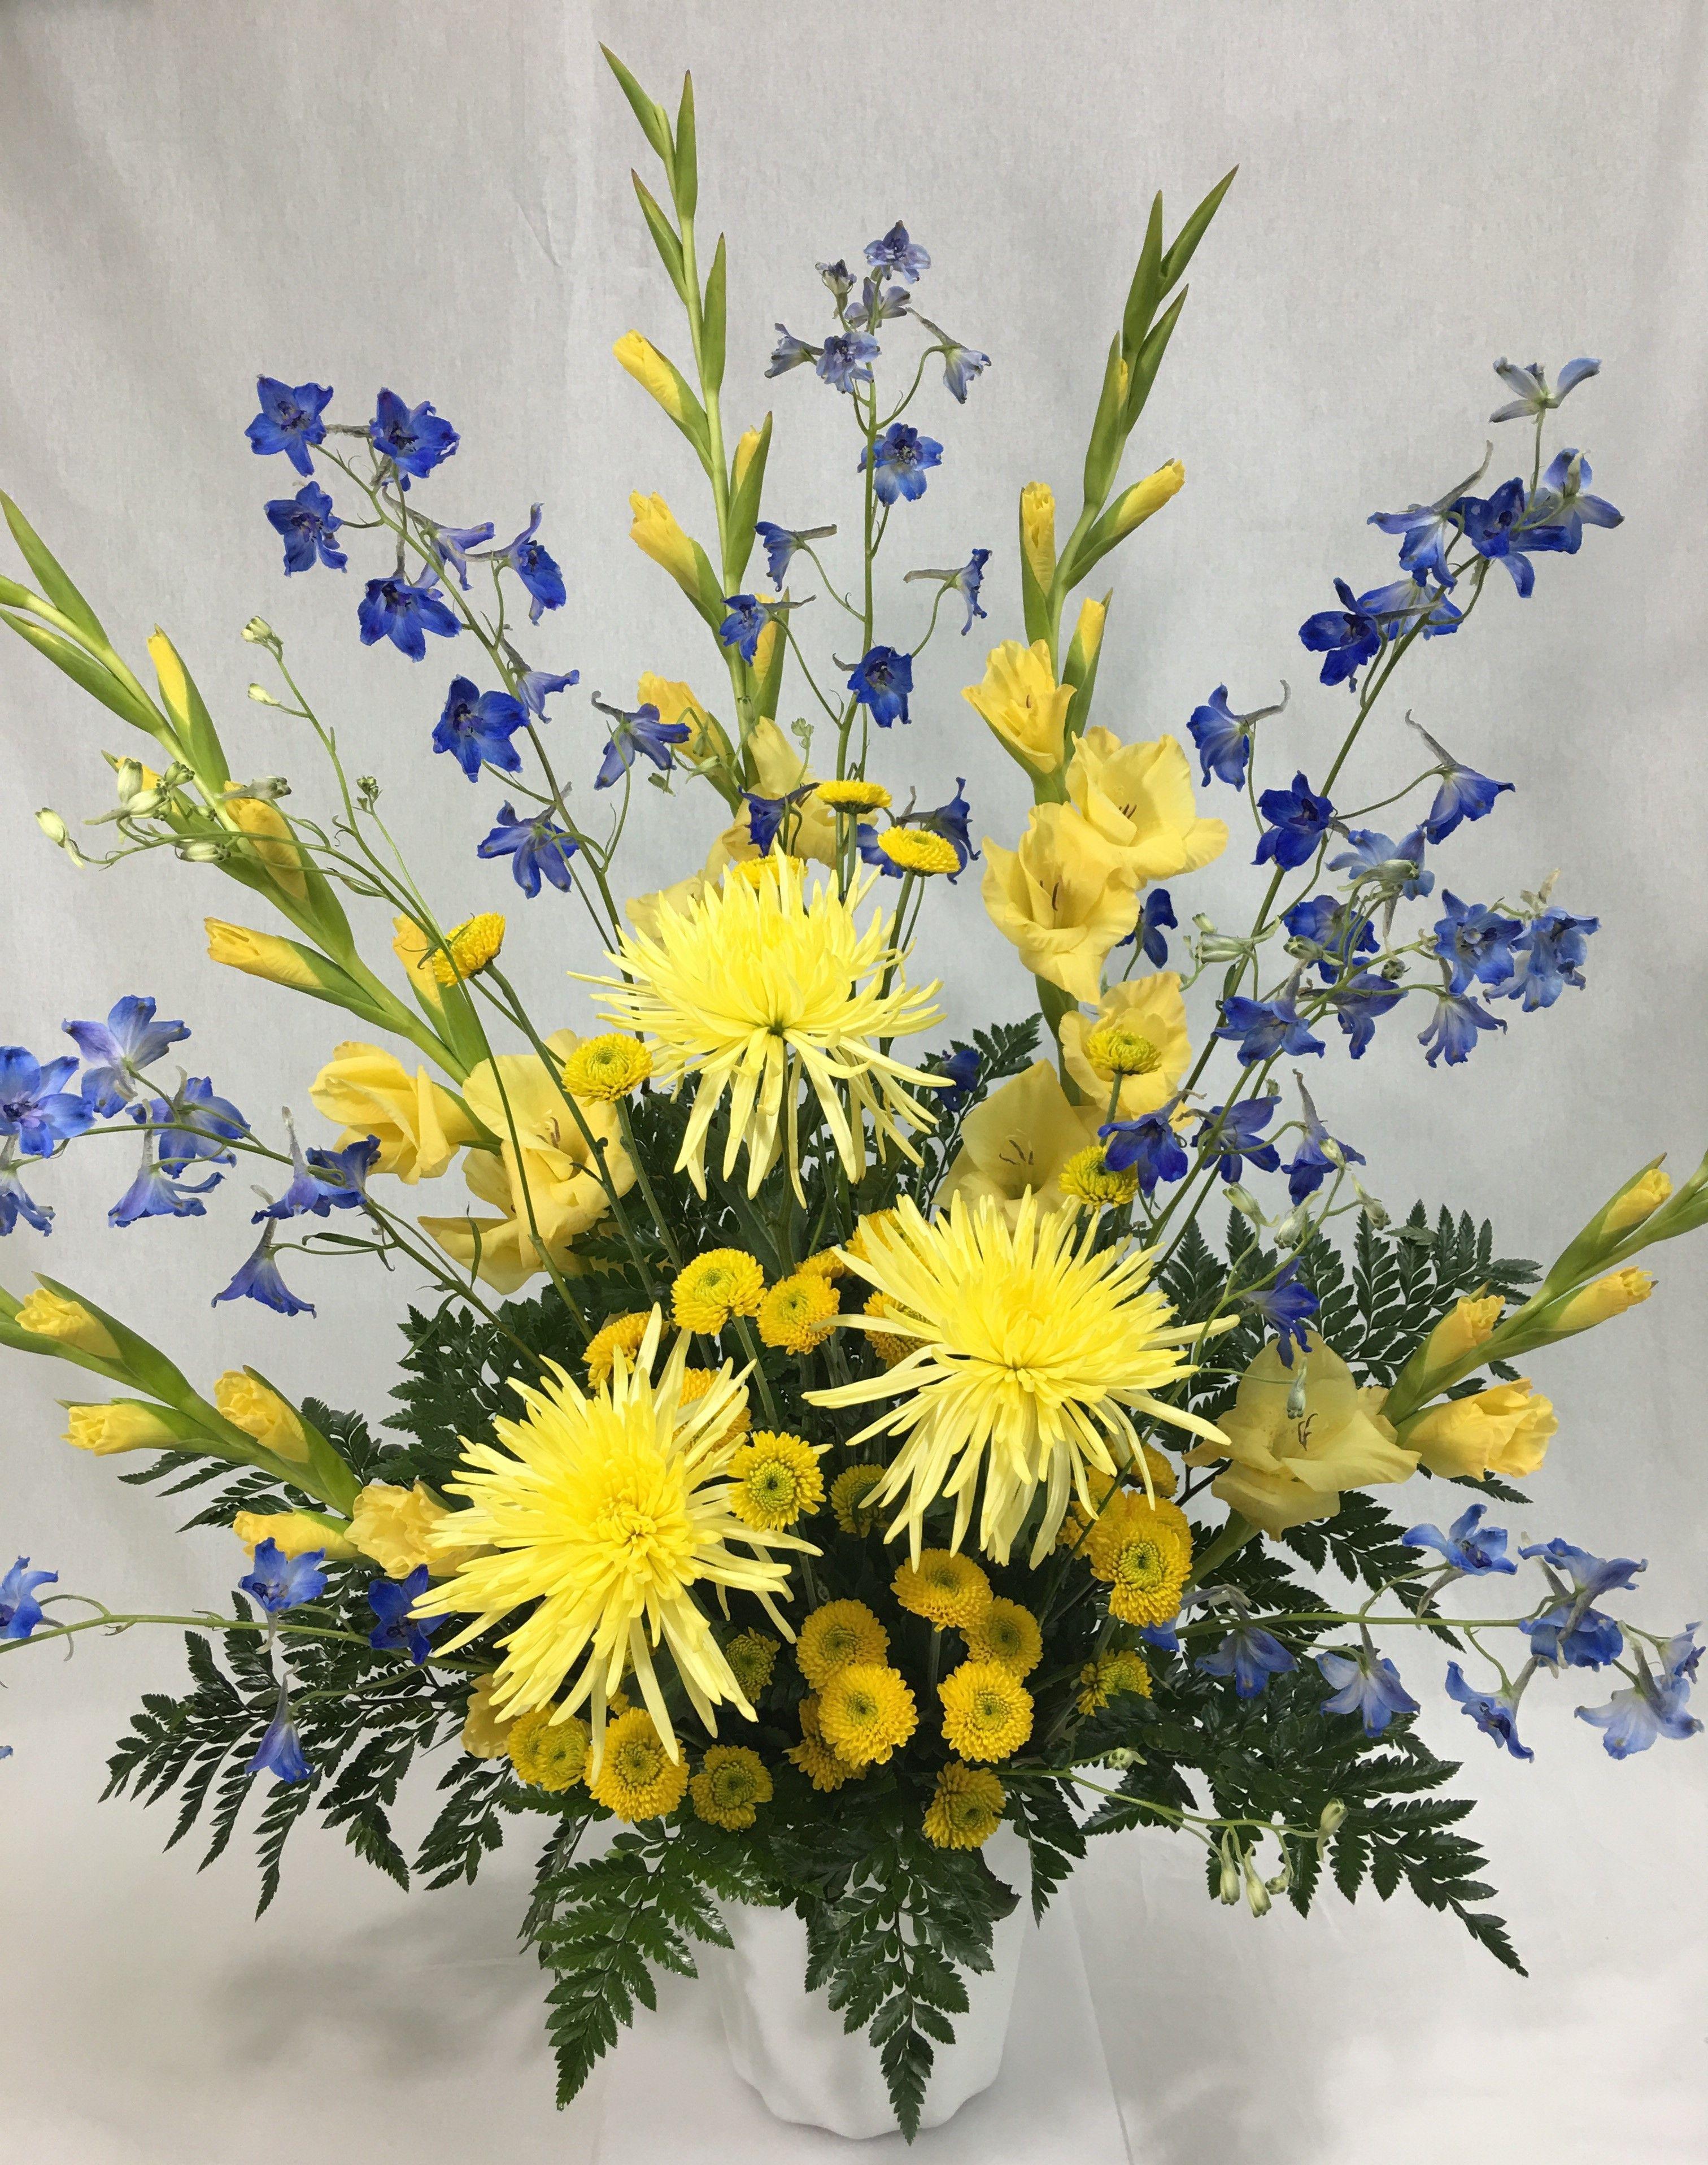 Yellow Gladiolas Blue Delphinium Yellow Spider Mums Yellow Button